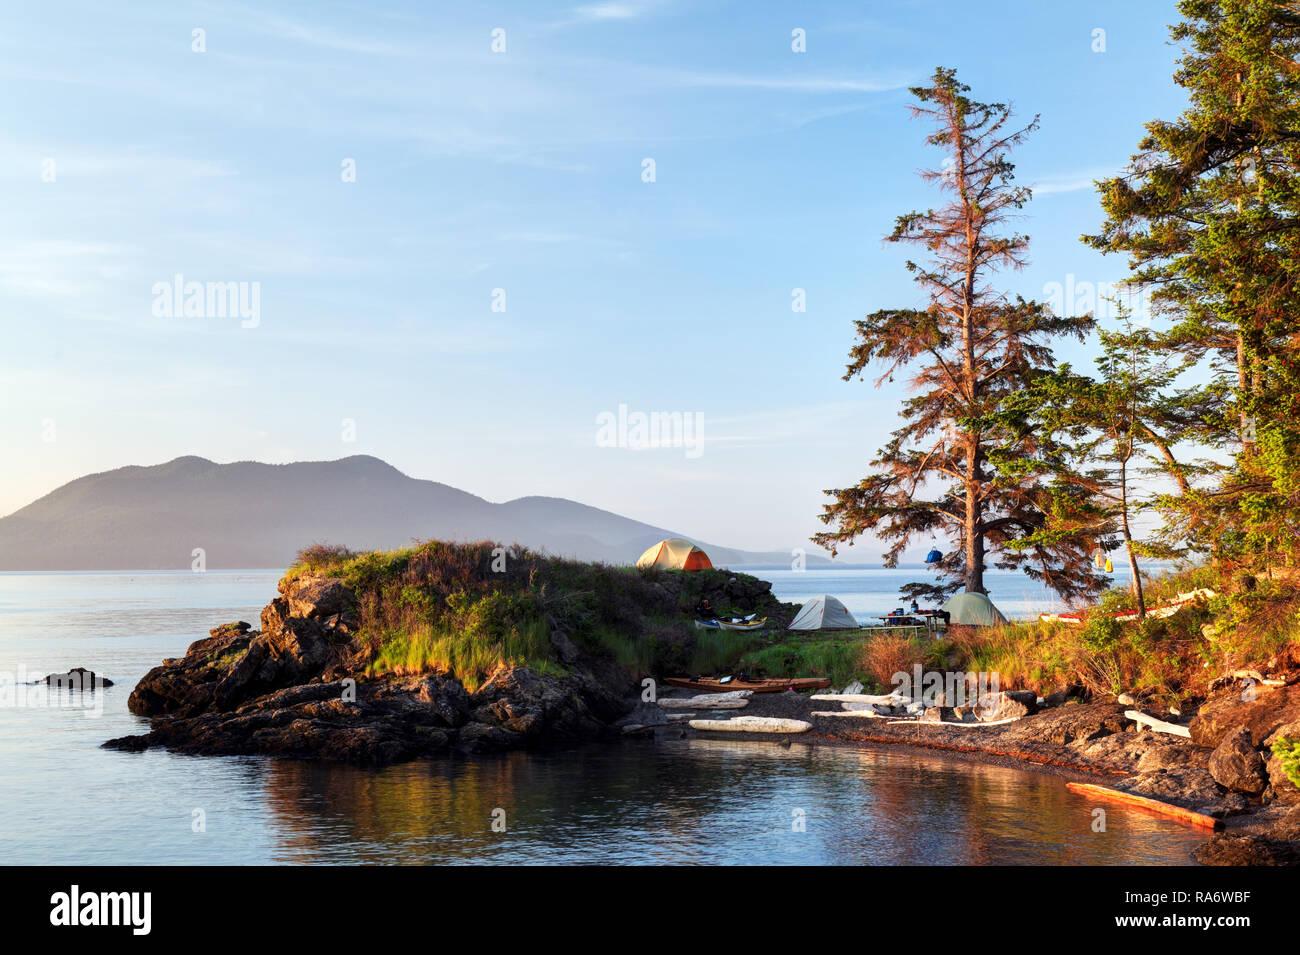 Sea kayakers camp on Doe Island, San Juan Islands, Washington State, USA - Stock Image